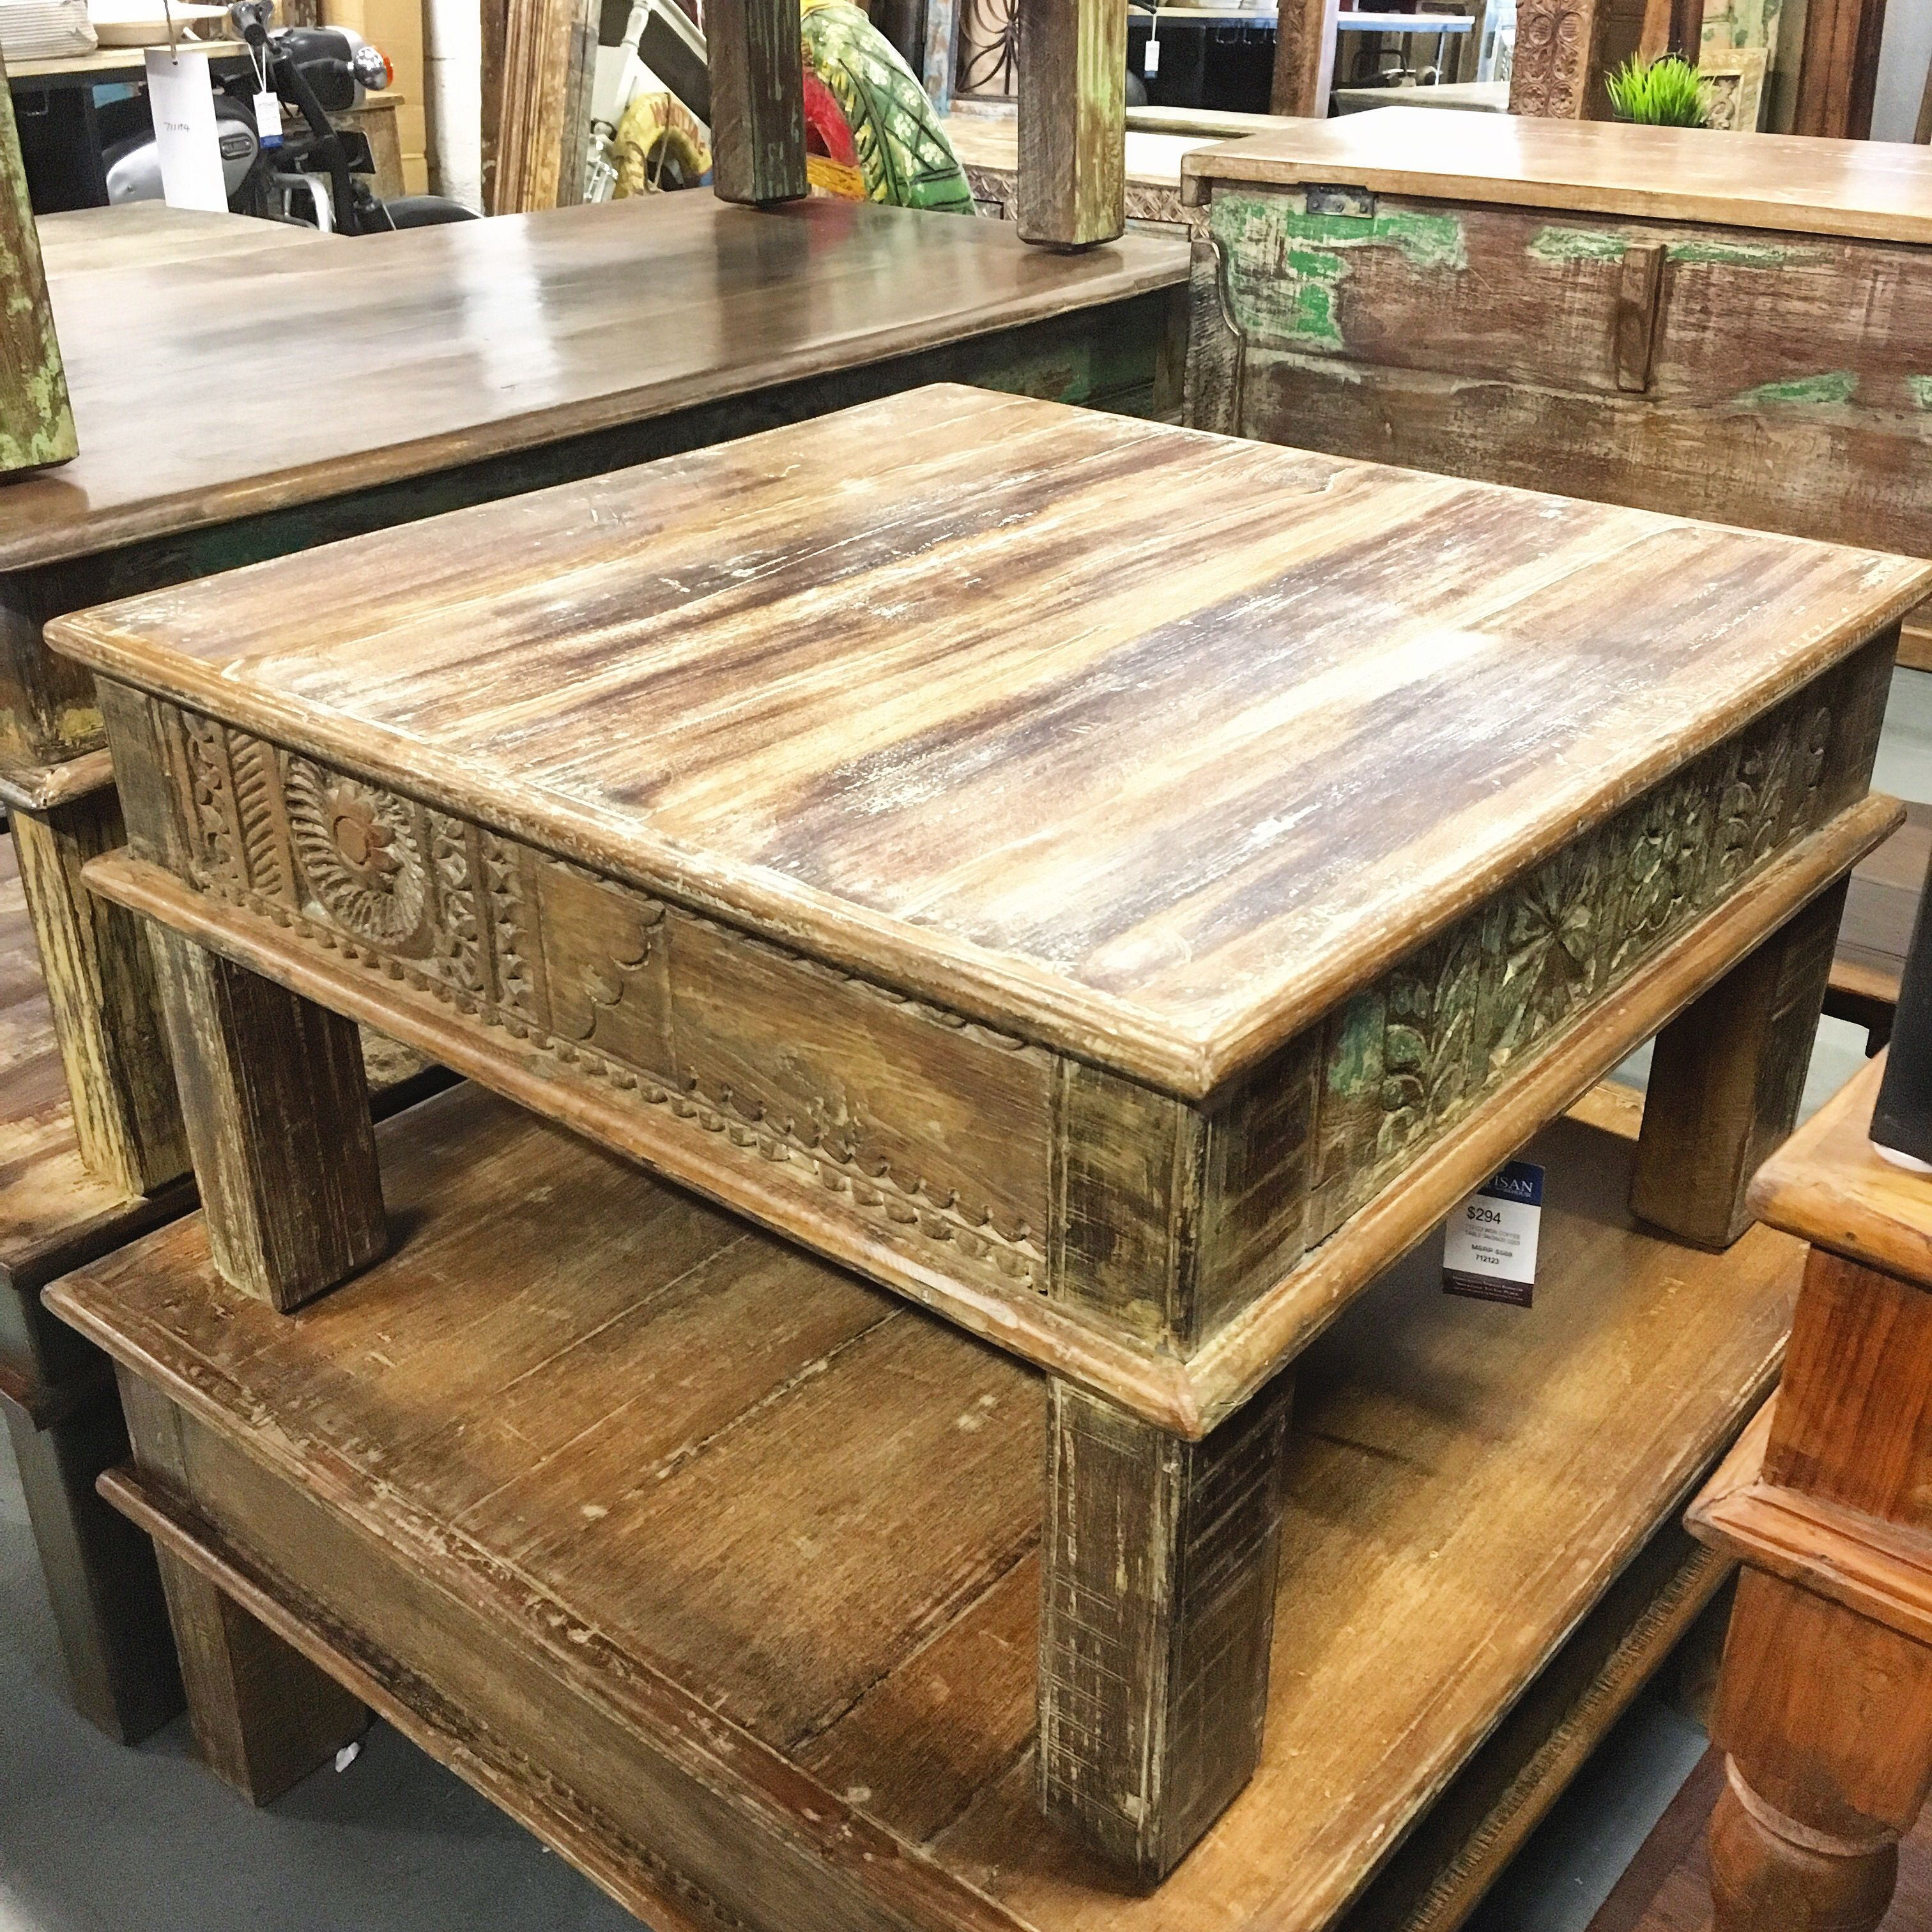 Square Coffee Table Coffee Table Square Coffee Table Pallet Coffee Table [ 3024 x 3024 Pixel ]